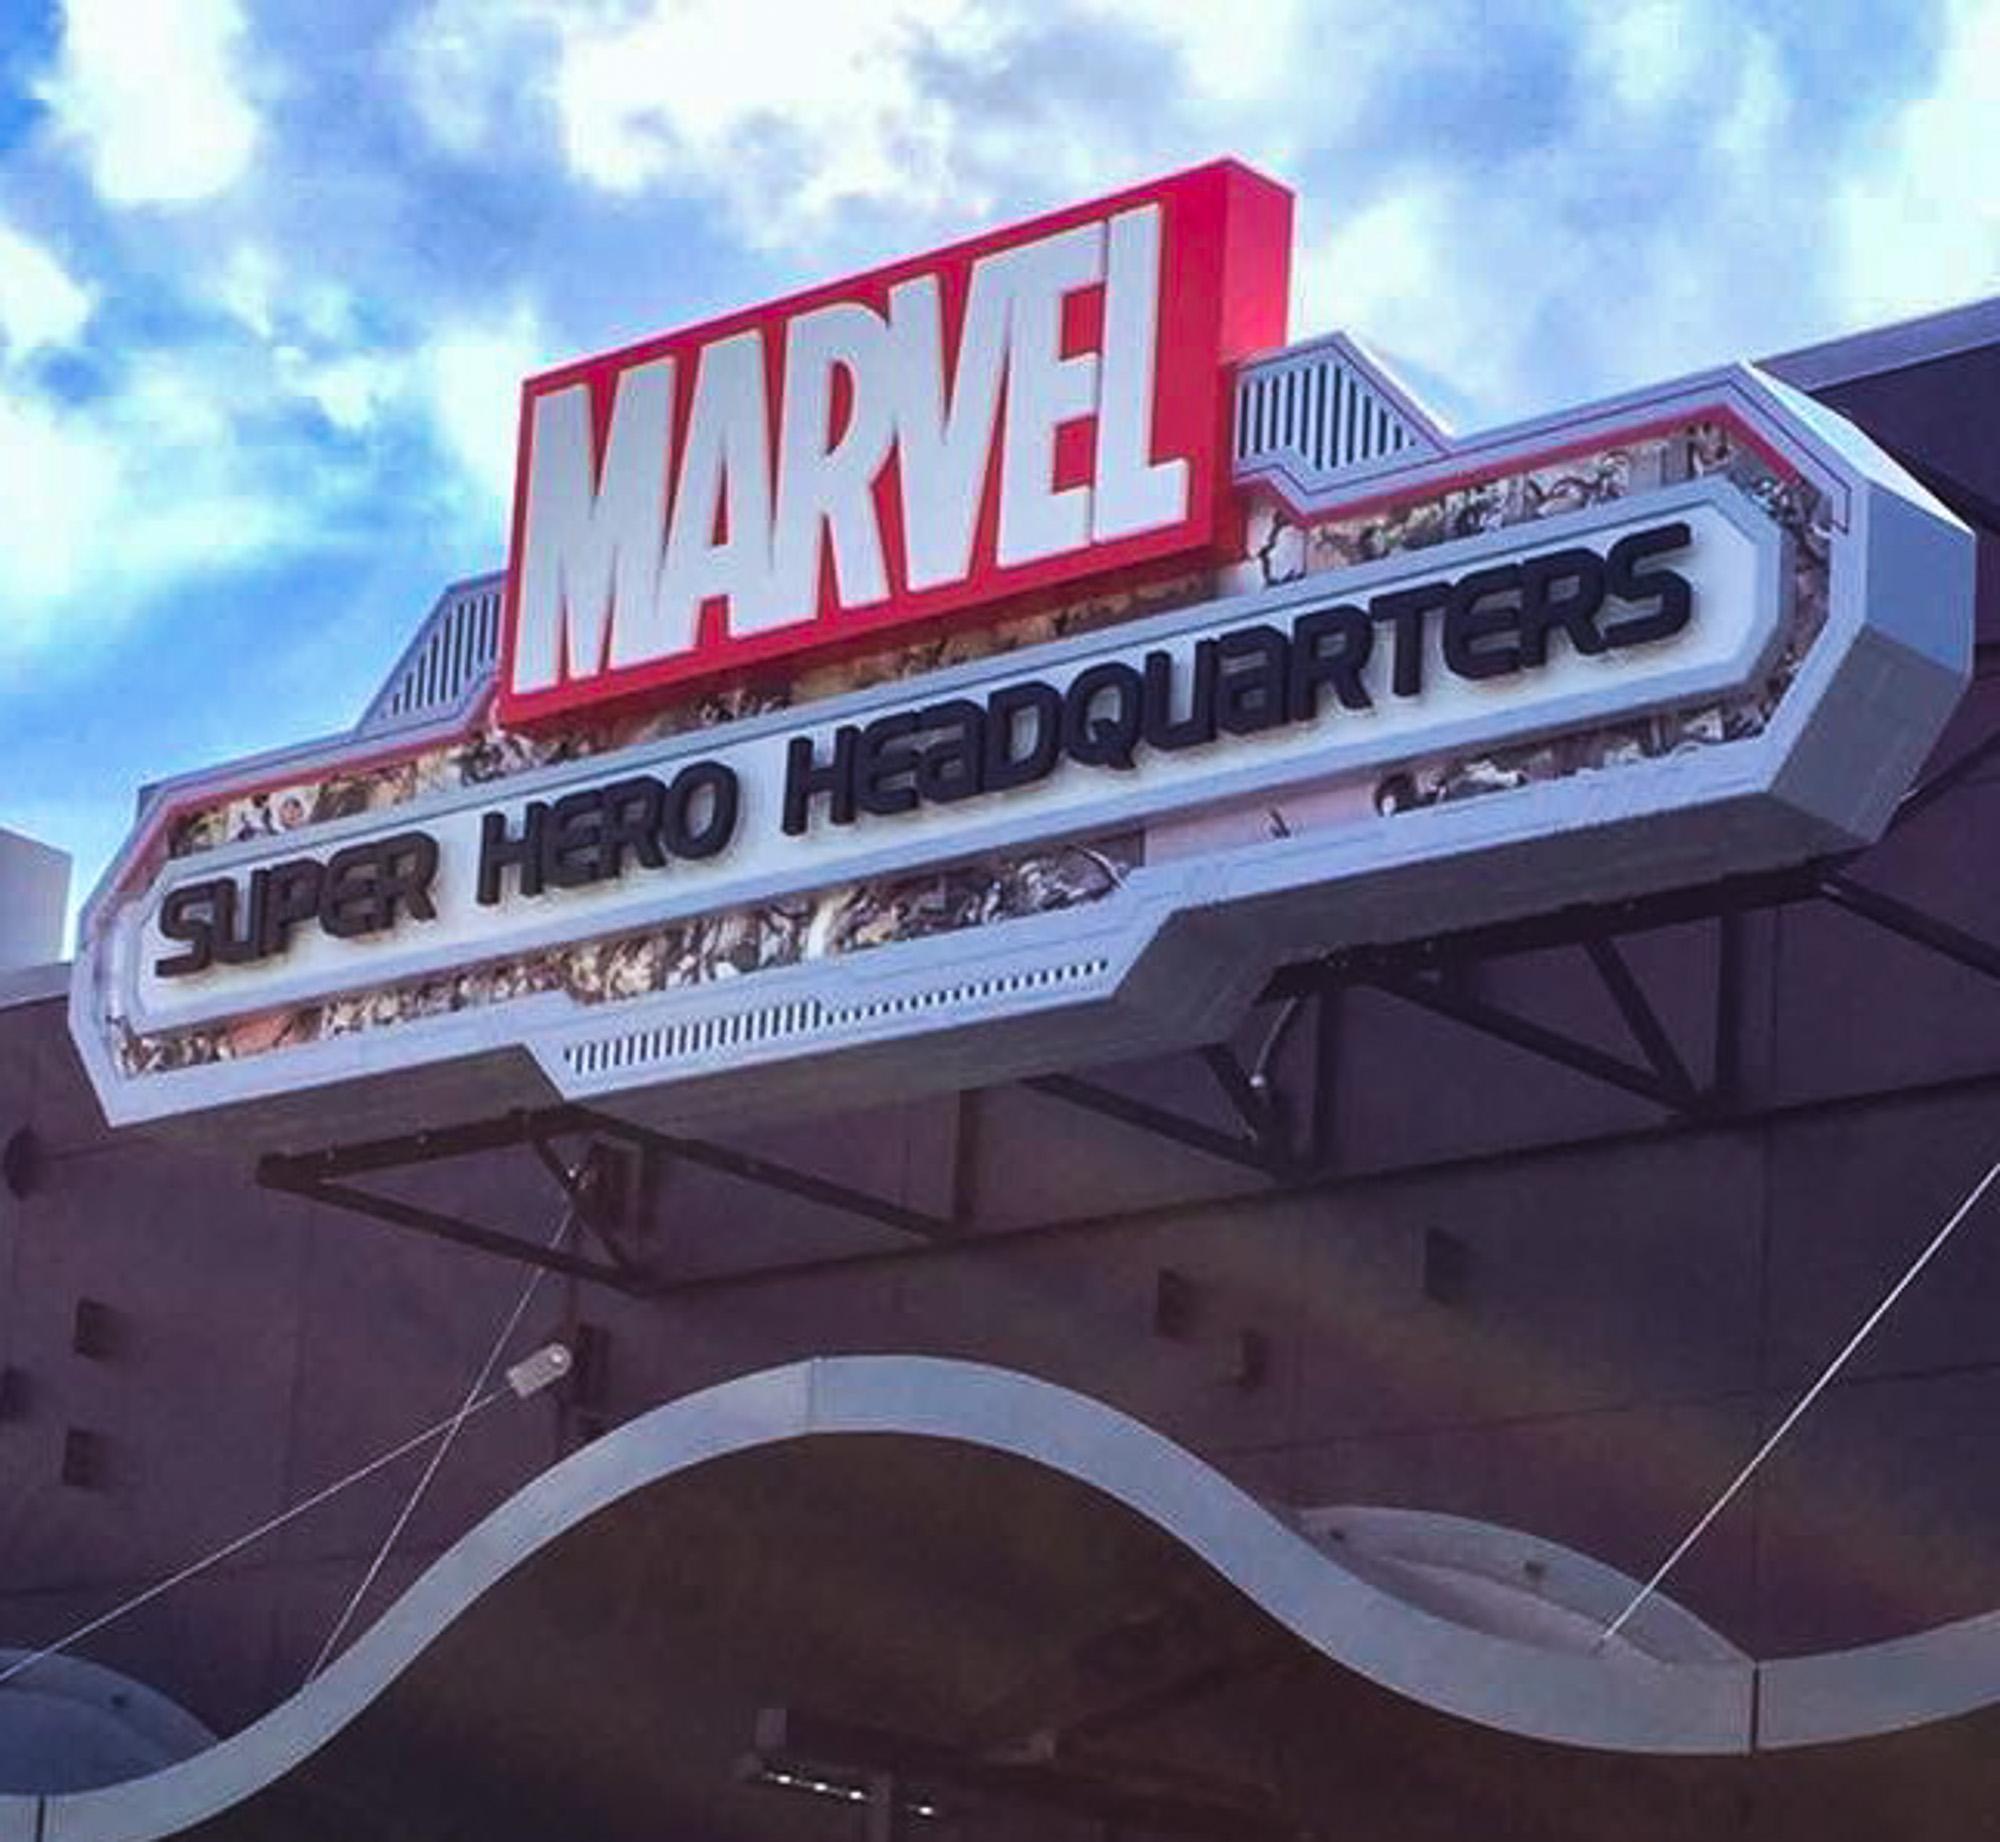 Marvel Branding Comes To Disney Springs